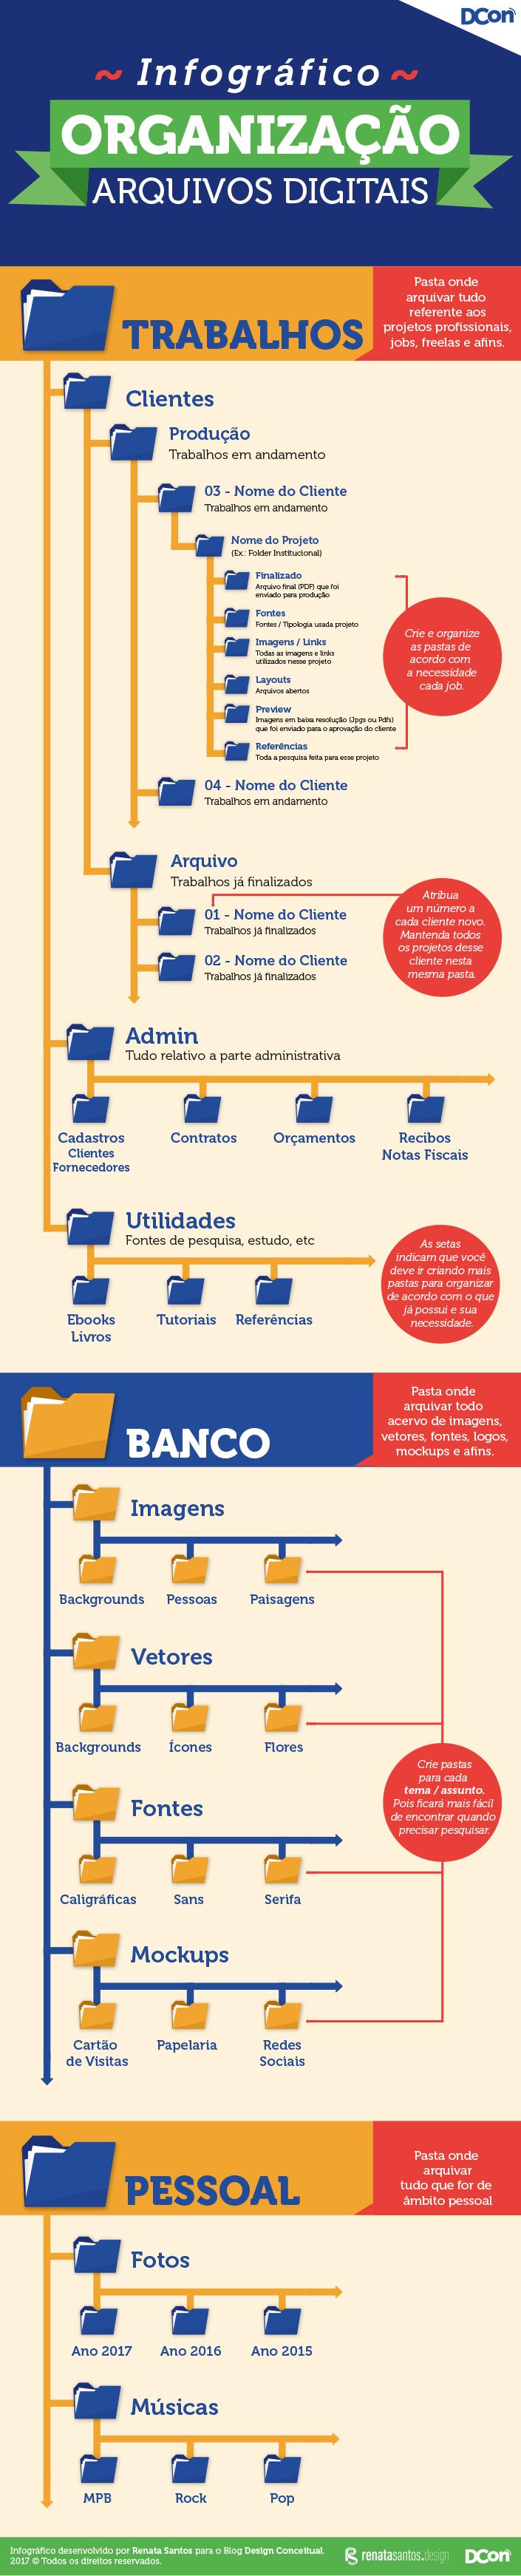 [infografico]organizacao